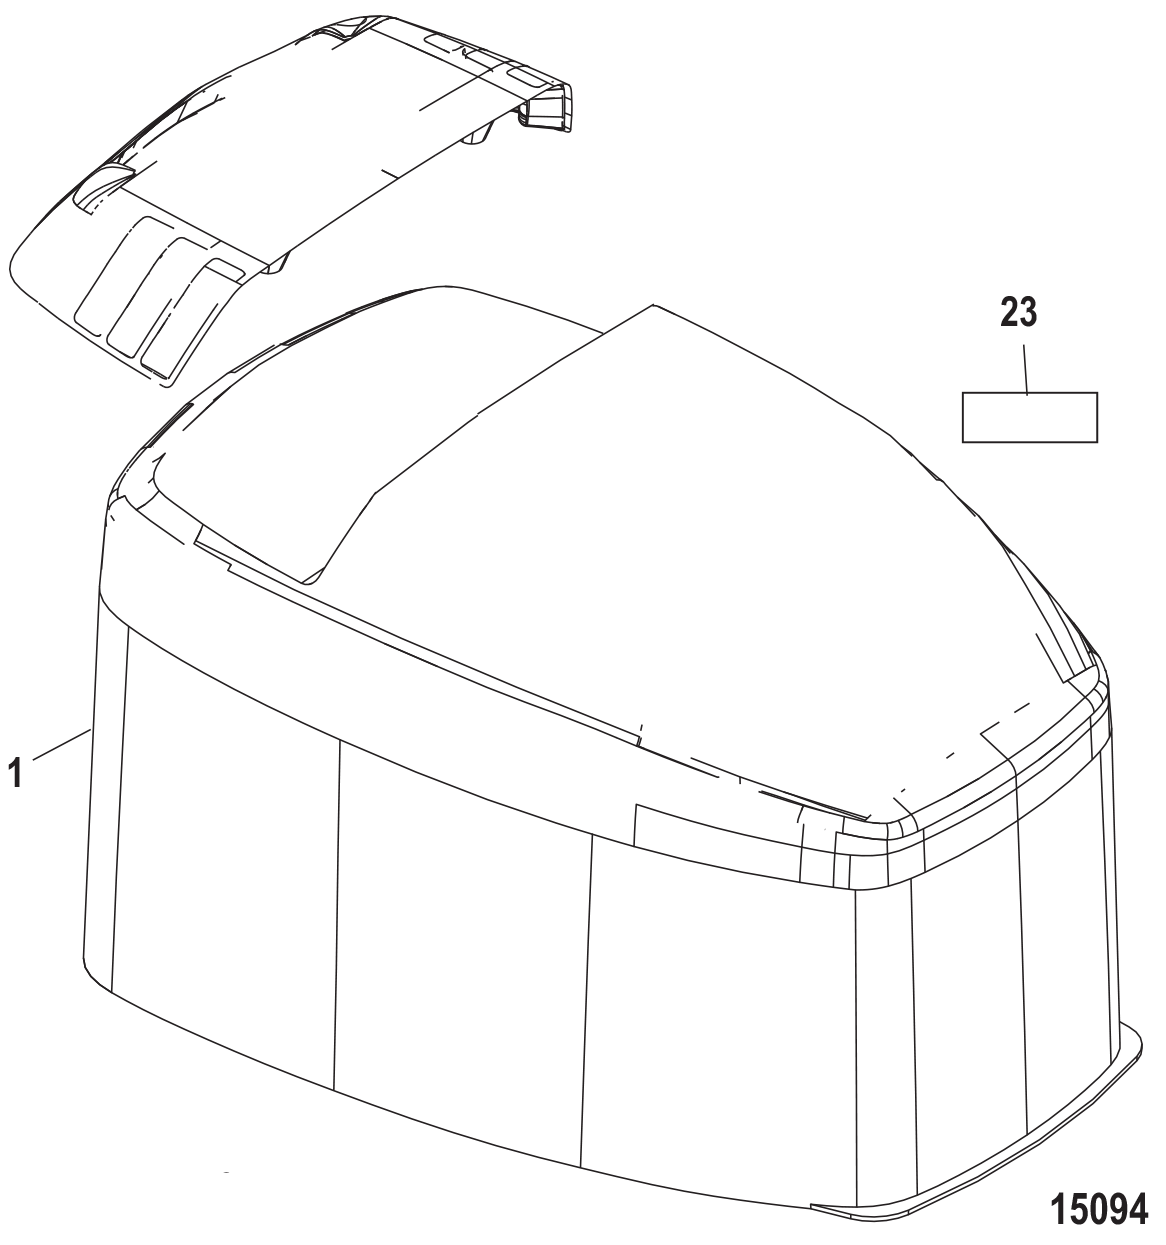 Outboard Decal Replicas Diagram Of 8 2 Cyl2strokeinternational Mercury Decals